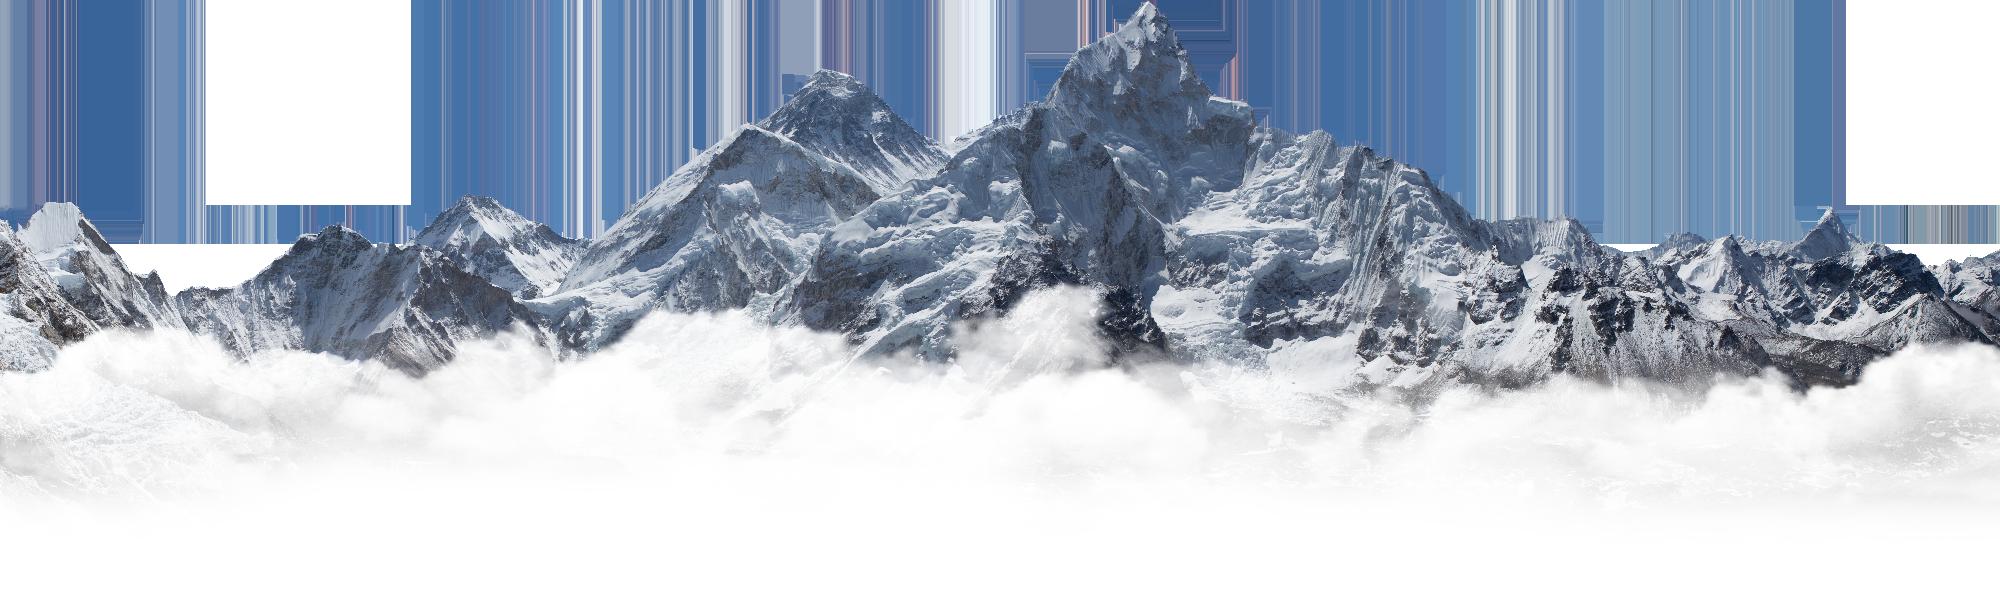 HD Everest Mountain.